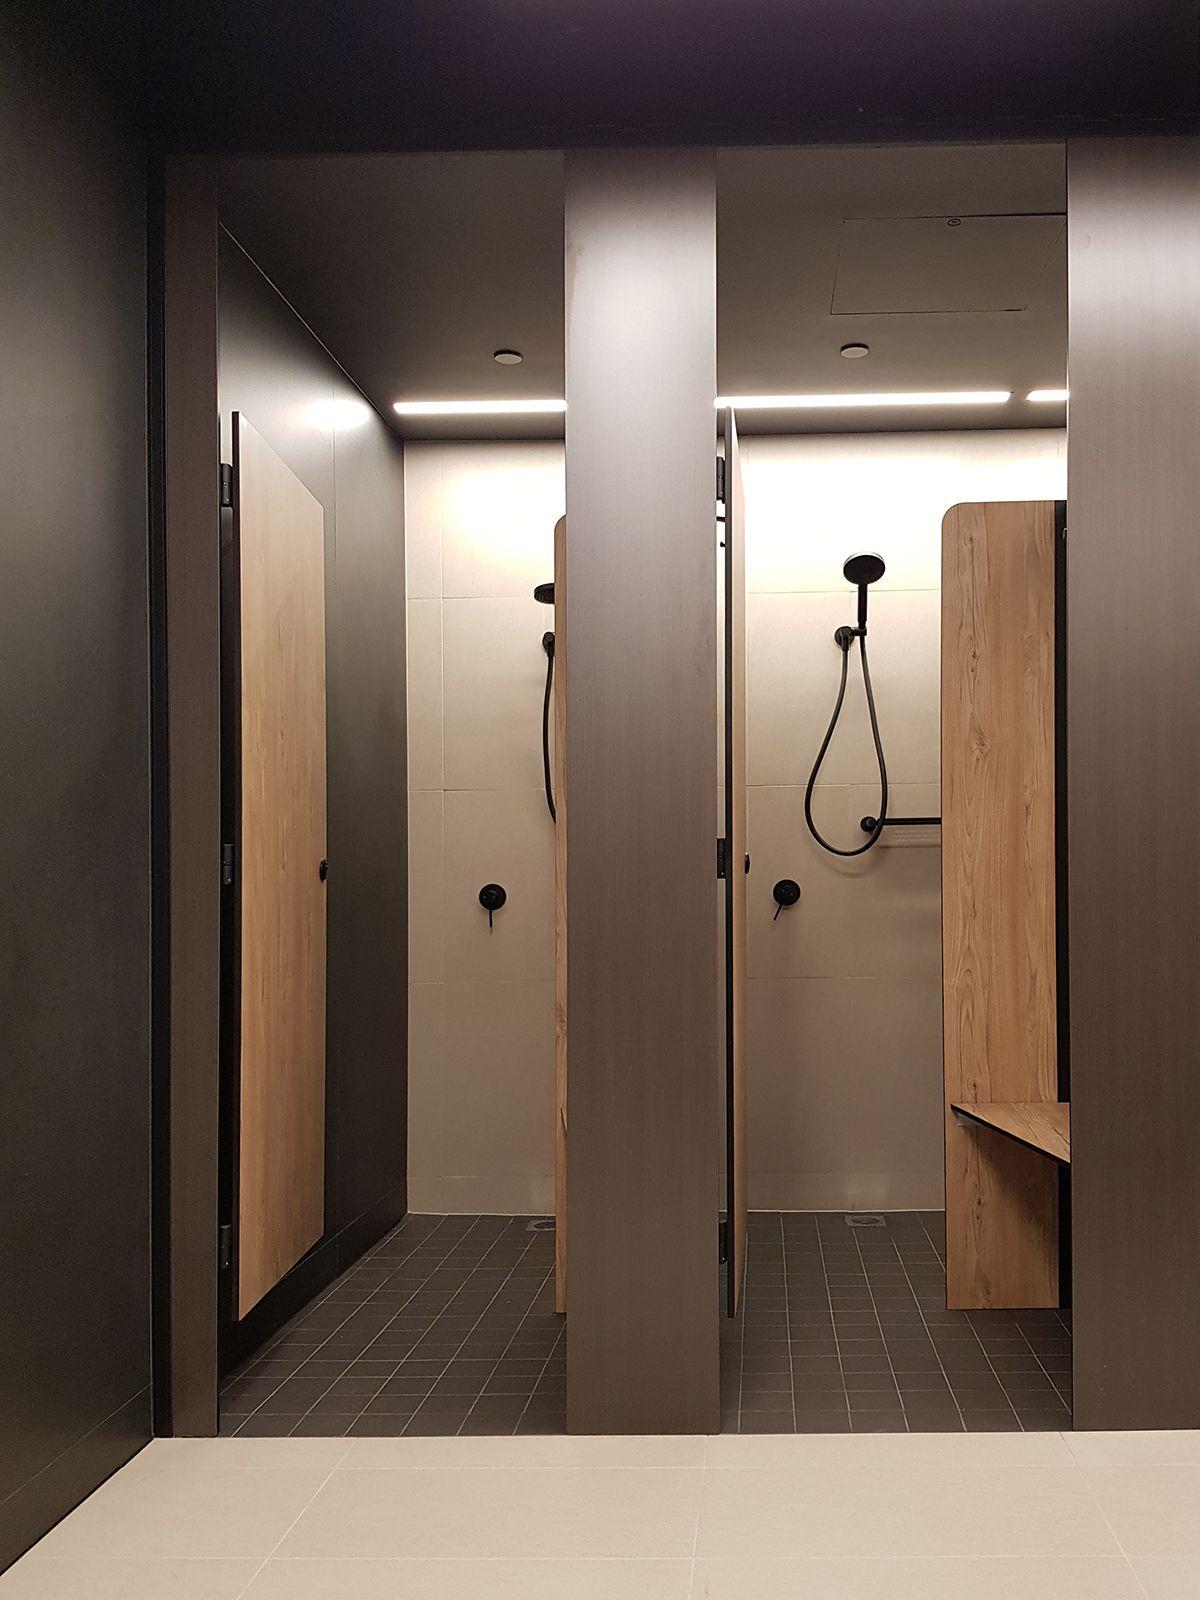 Aqualoo Windsor Compact Laminate Shower Partitions Restroom Design Public Restroom Design Cubicle Design